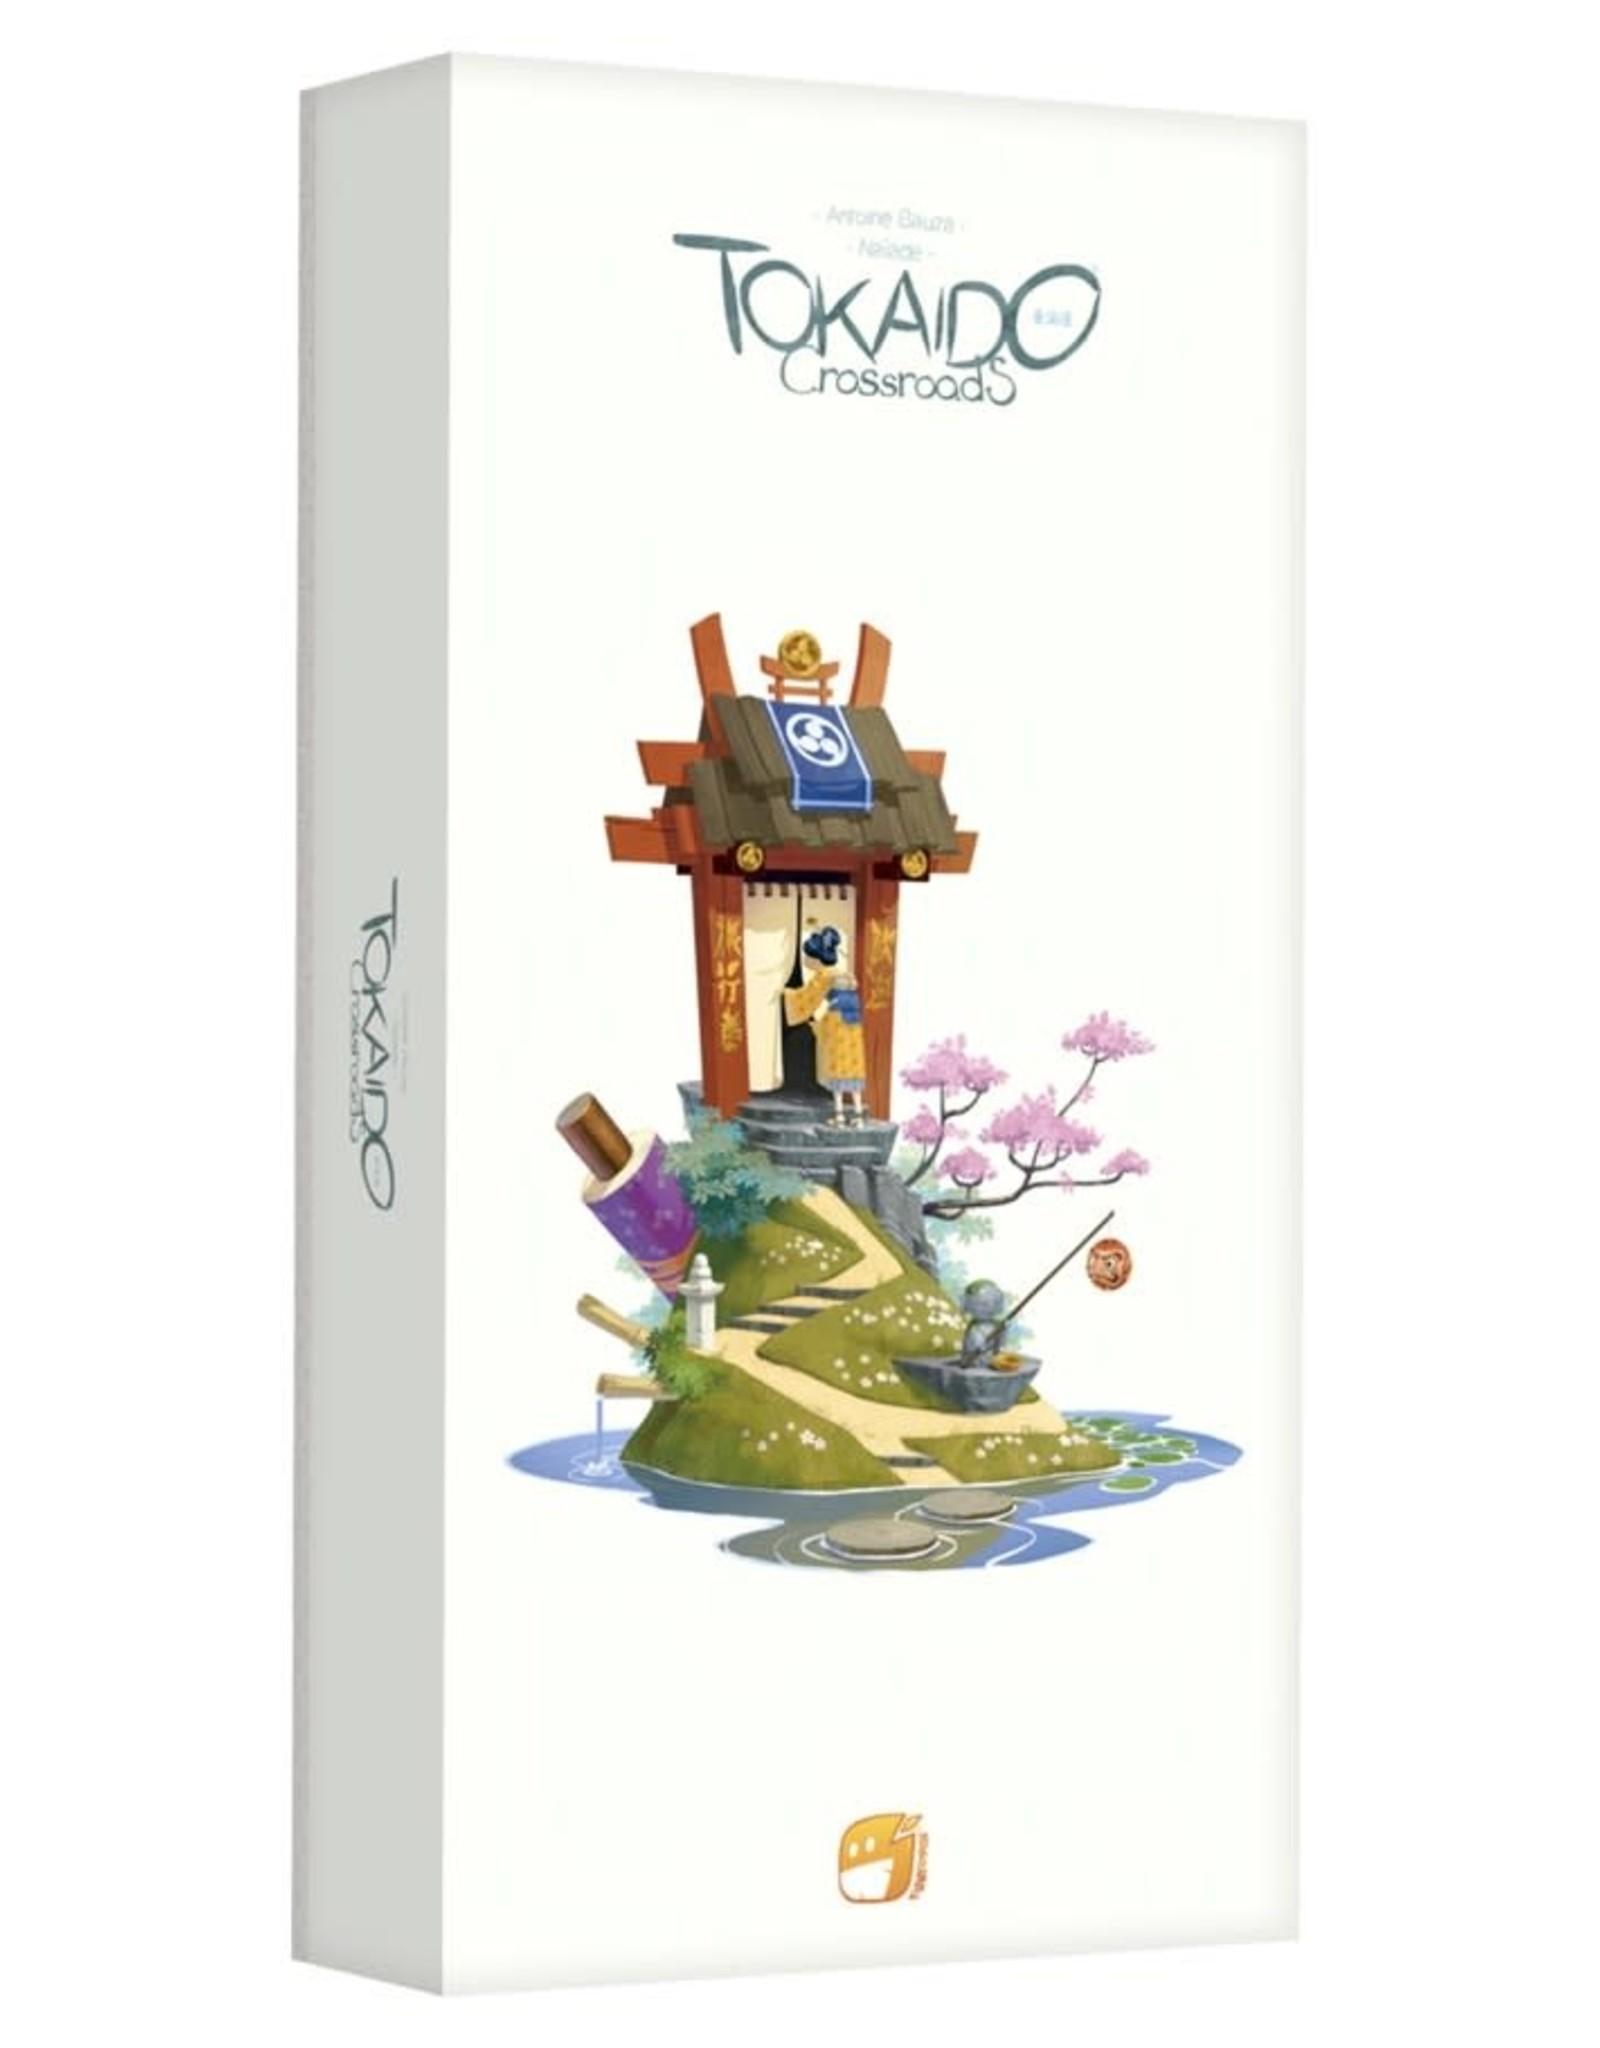 Tokaido Crossroads Expansion